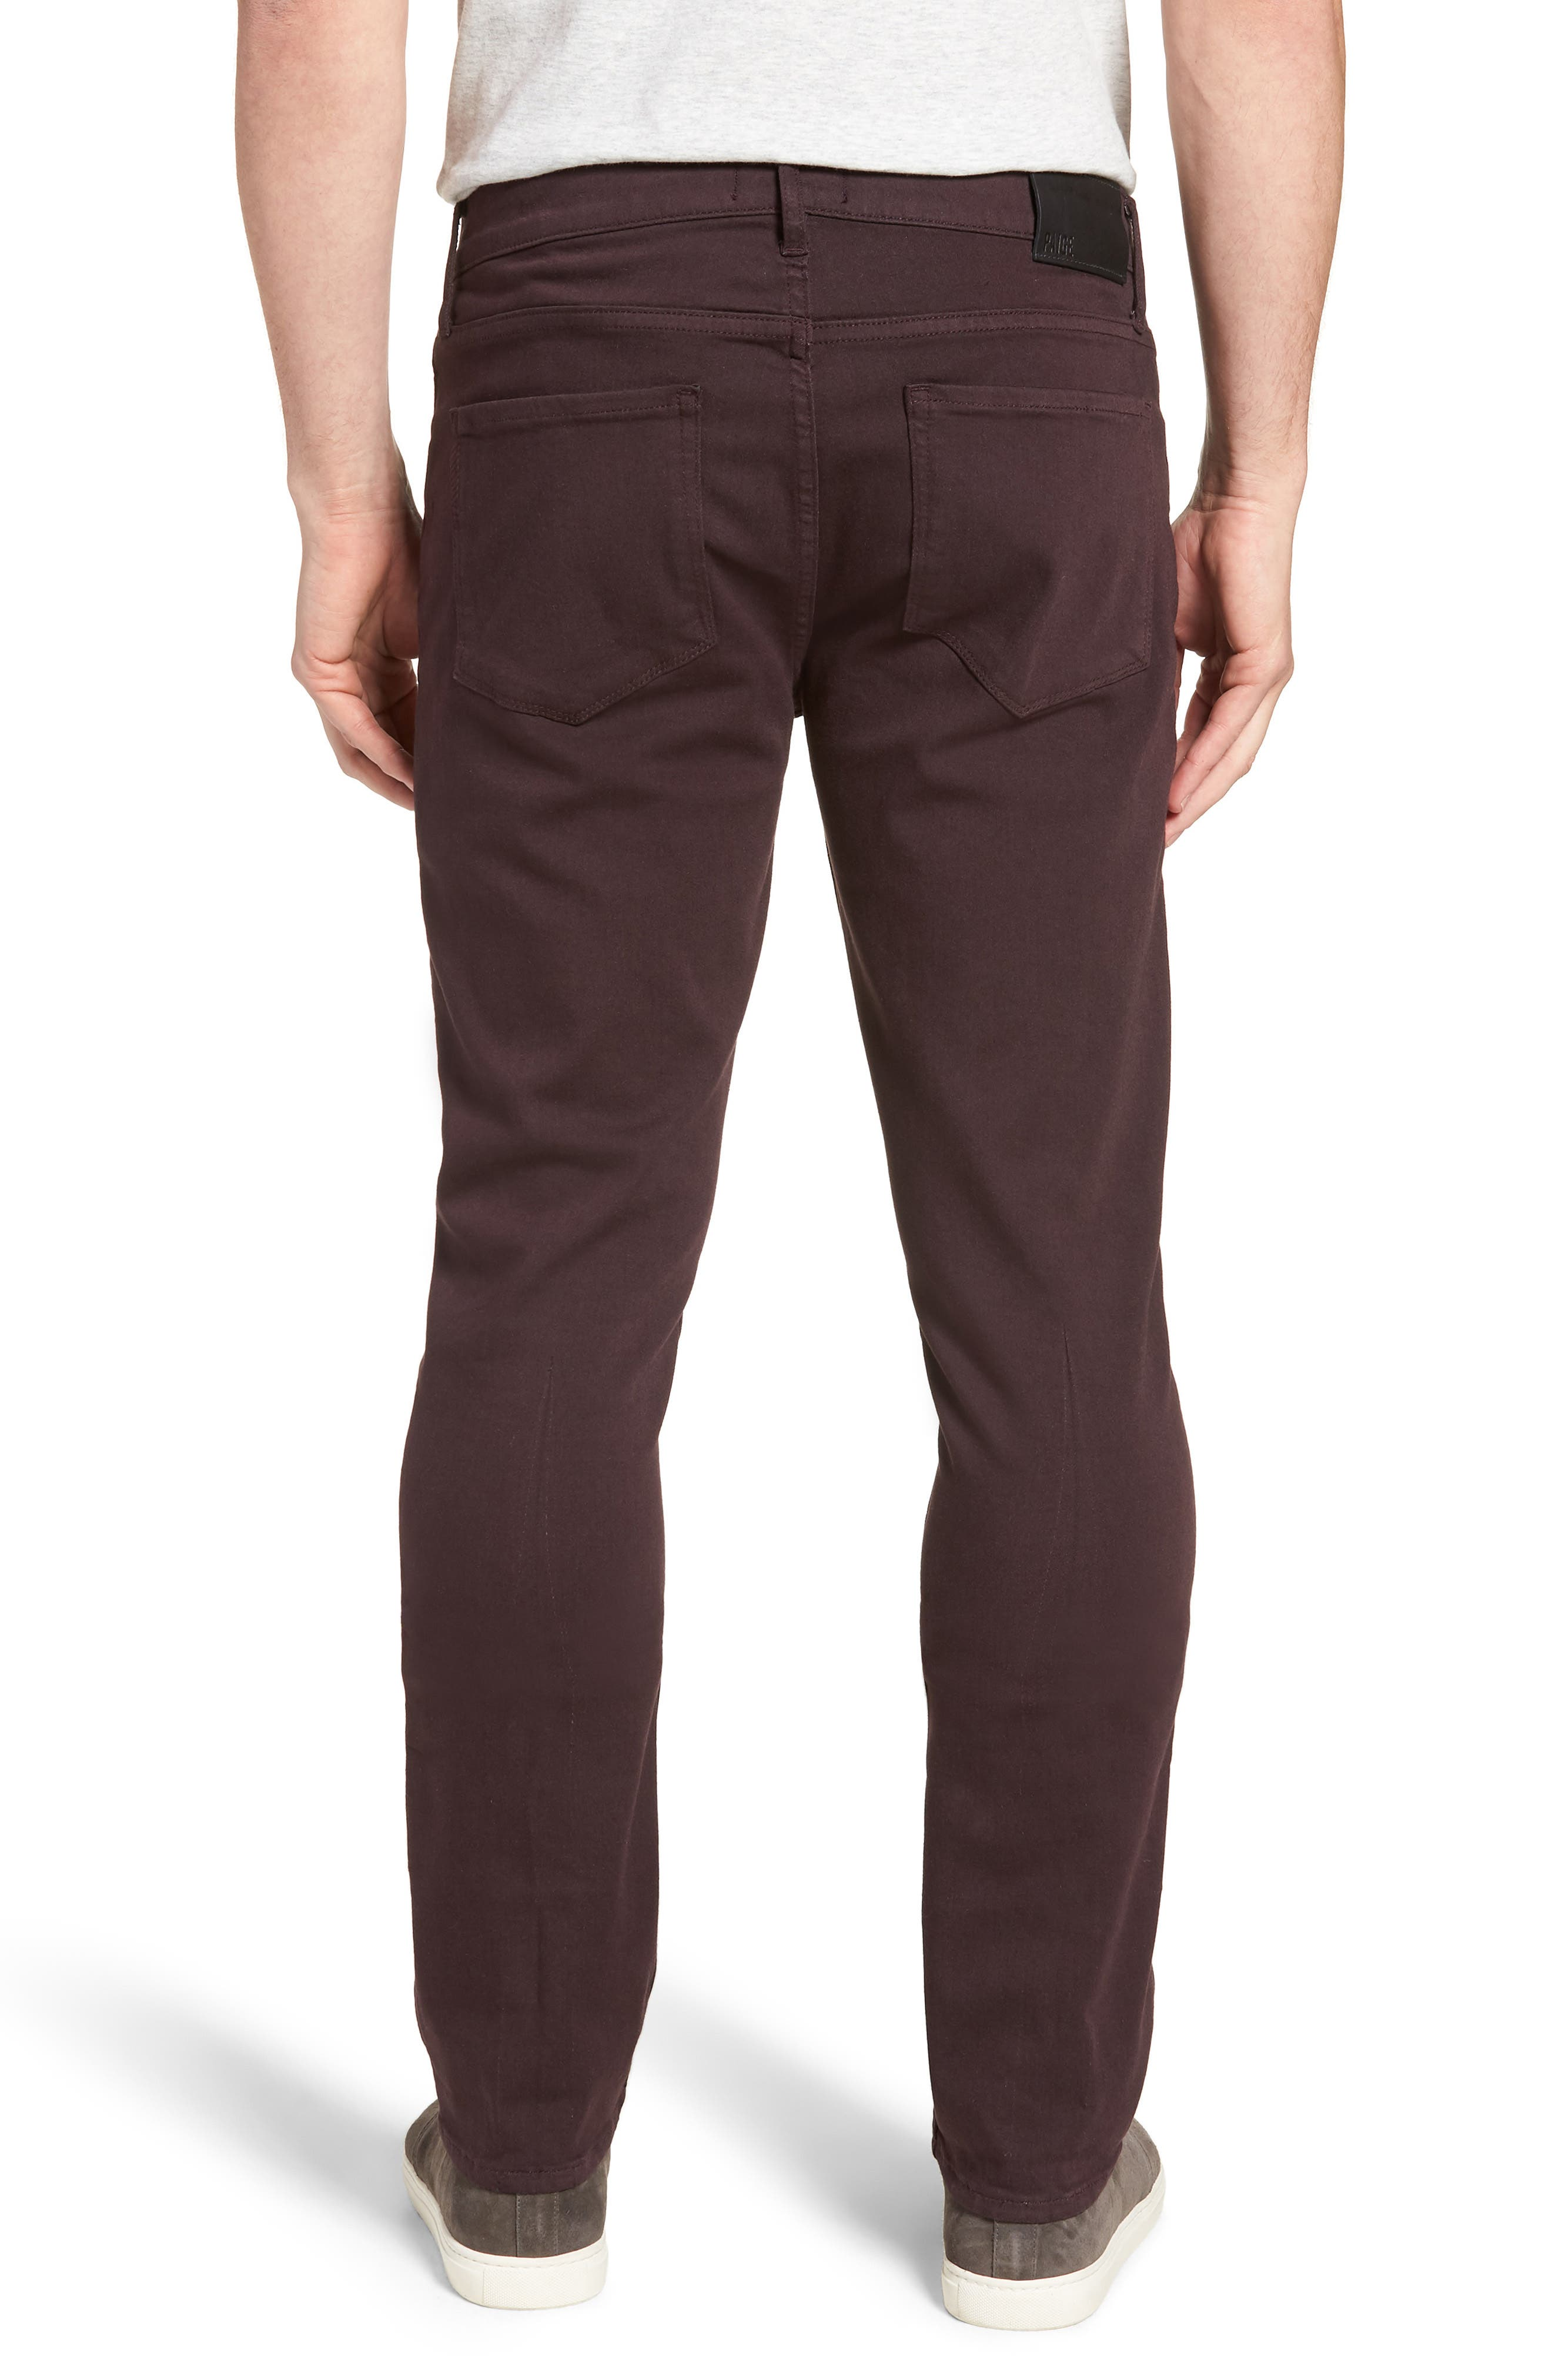 Transcend - Federal Slim Straight Fit Jeans,                             Alternate thumbnail 2, color,                             DARK PORT